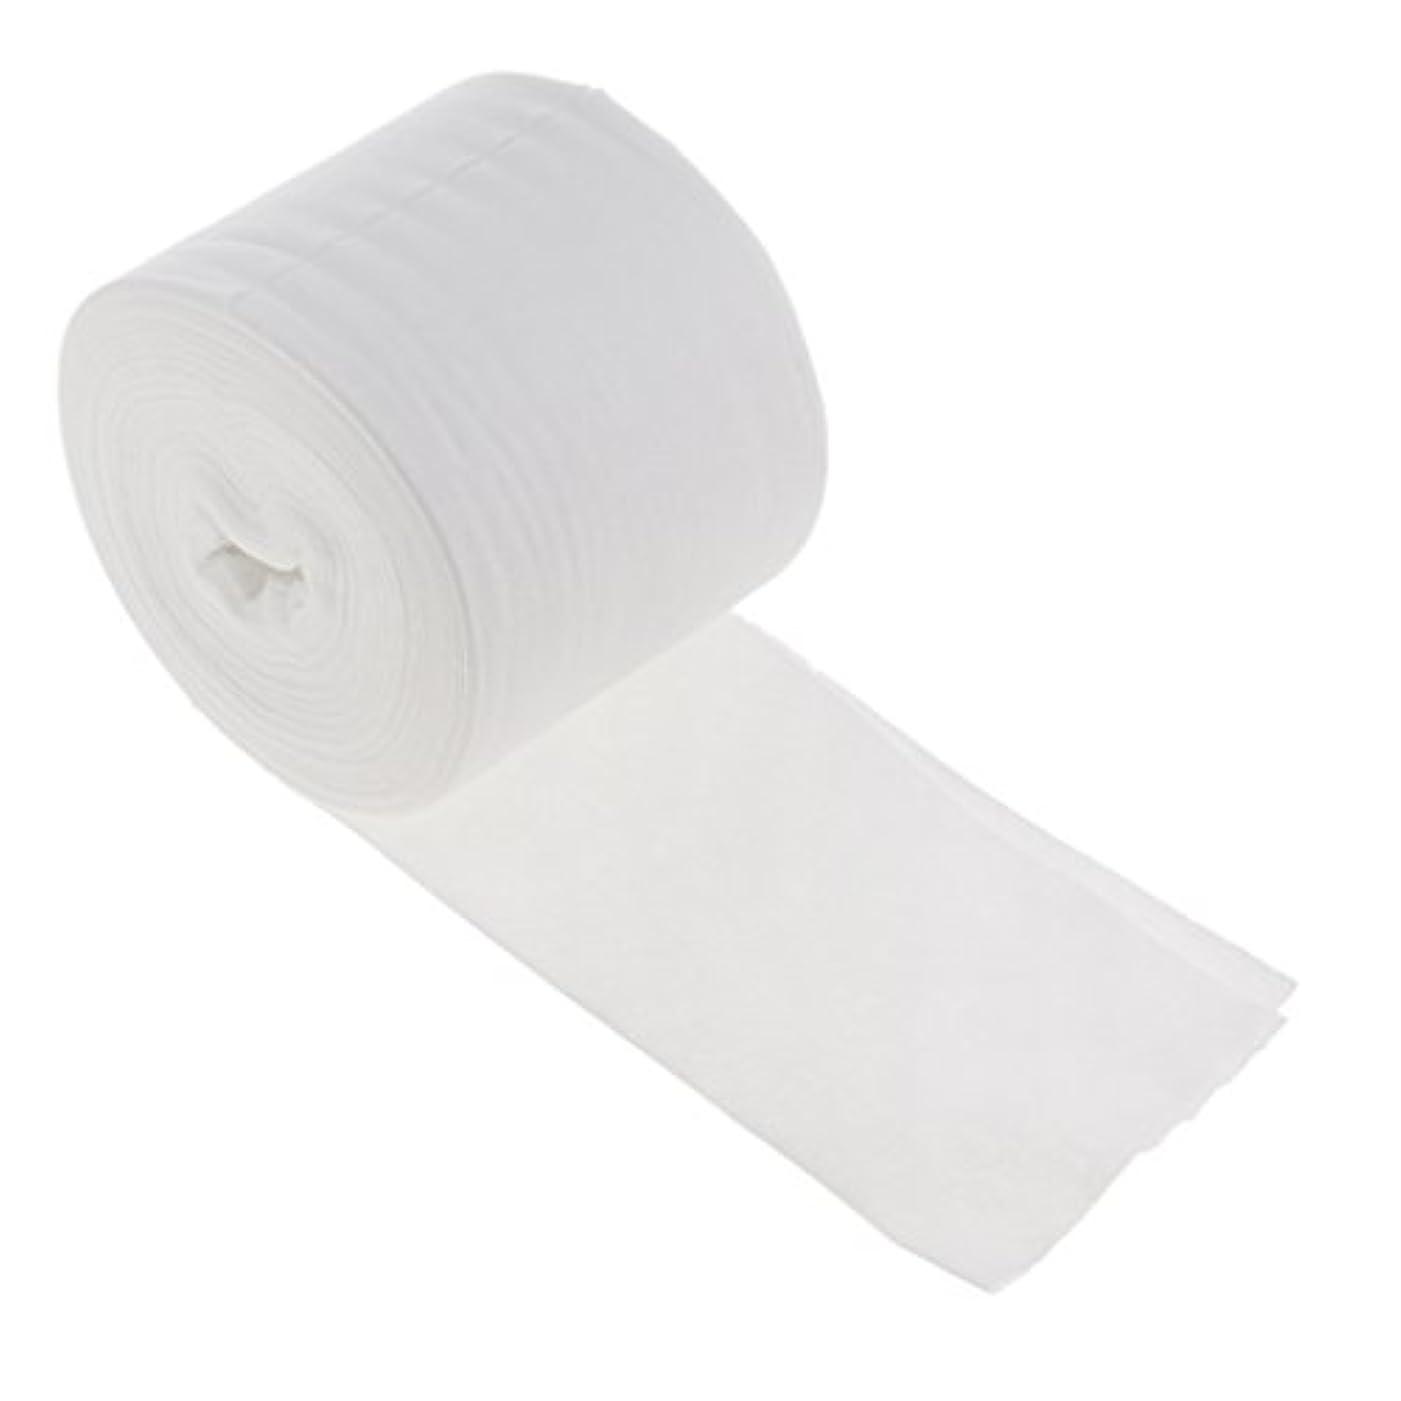 SM SunniMix 洗顔 フェイシャルタオル 顔タオル 使い捨て クリーニング 柔らかい 不織布 衛生的な